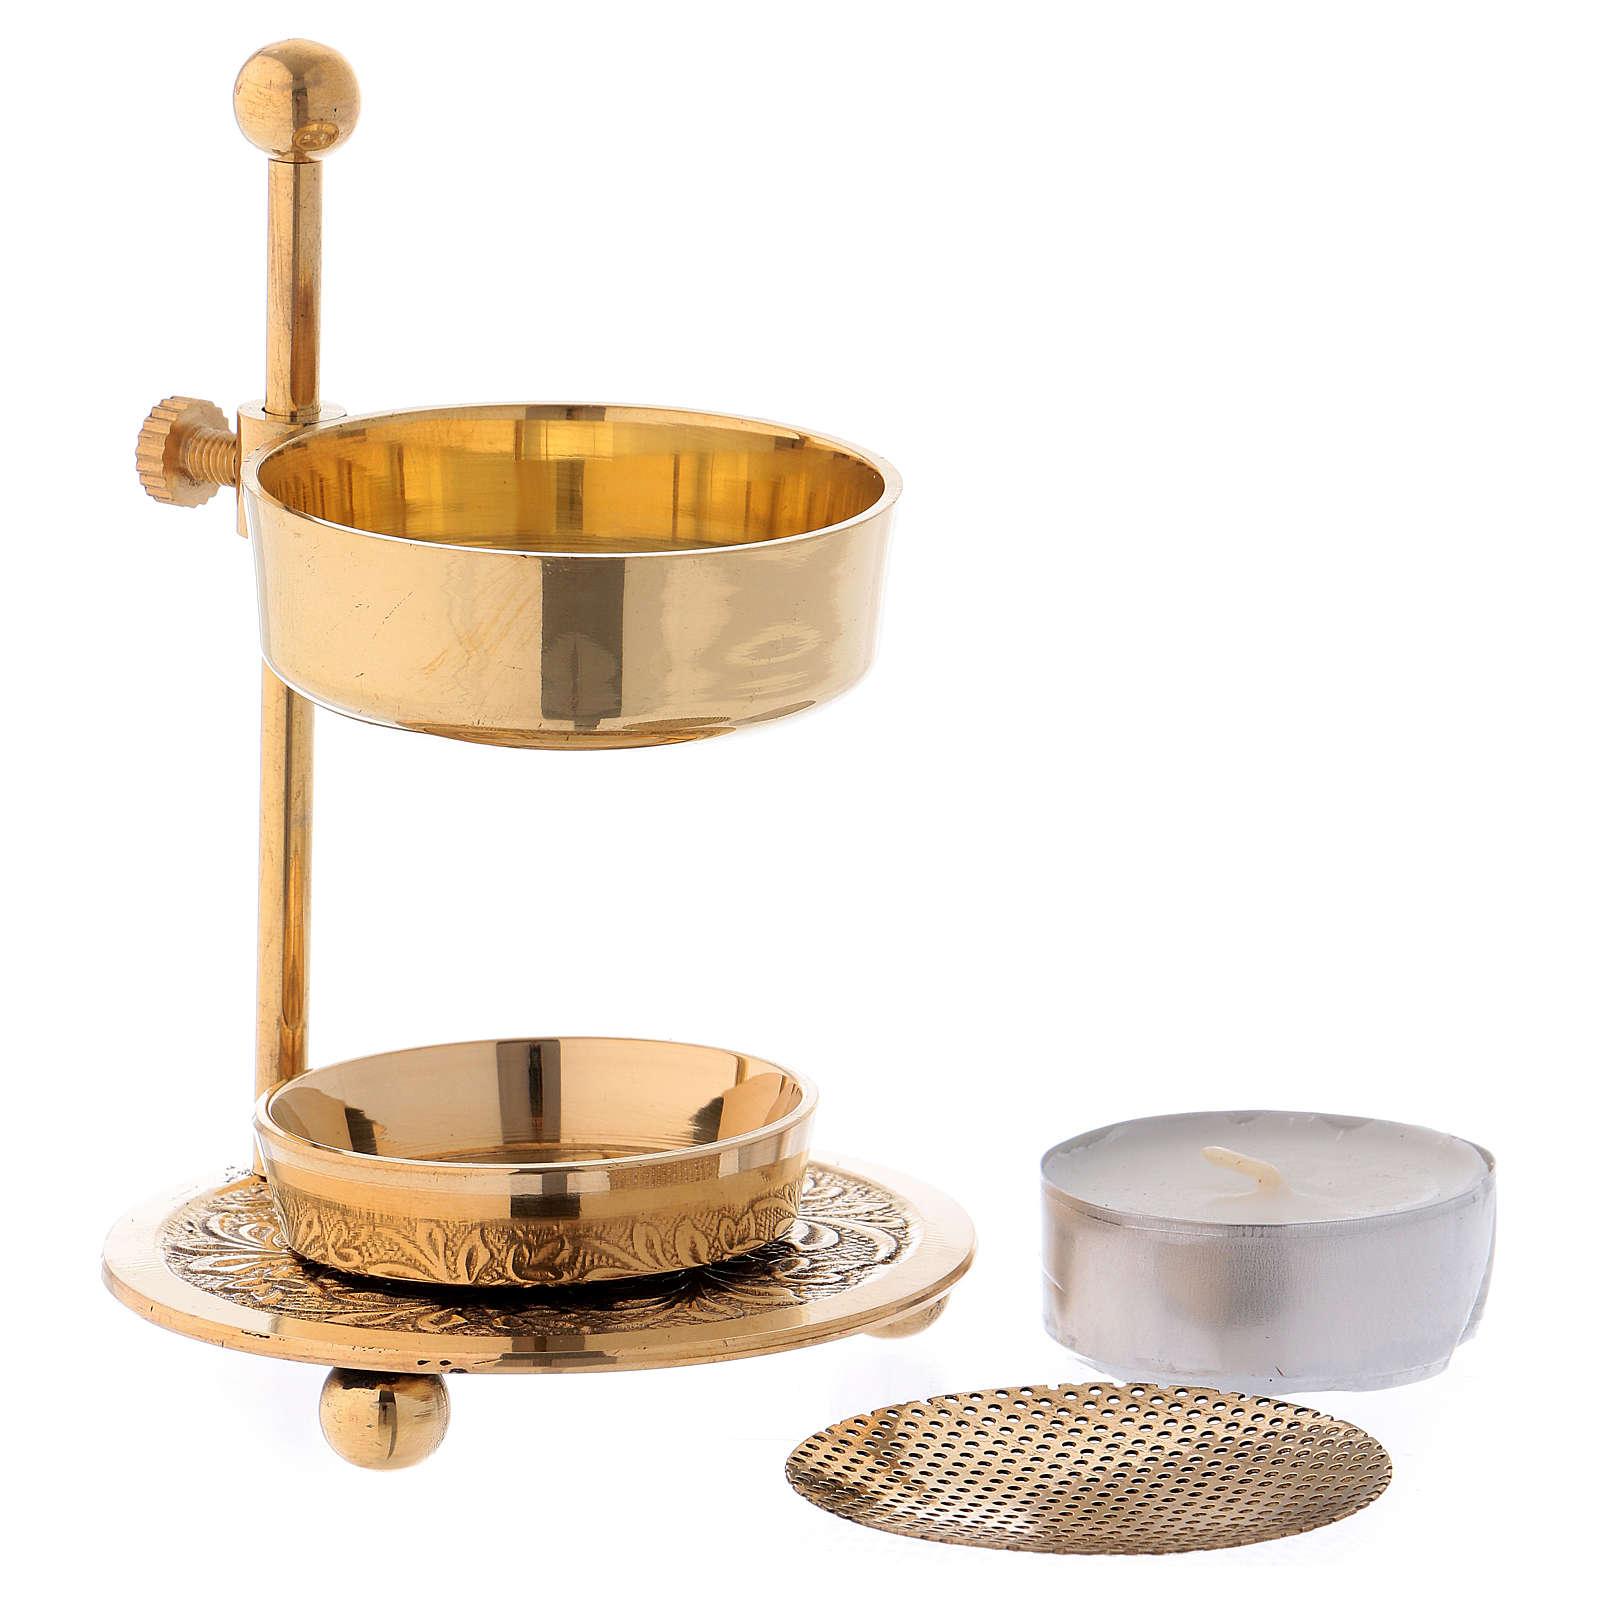 Incense burner in gold-plated brass 11 cm 3